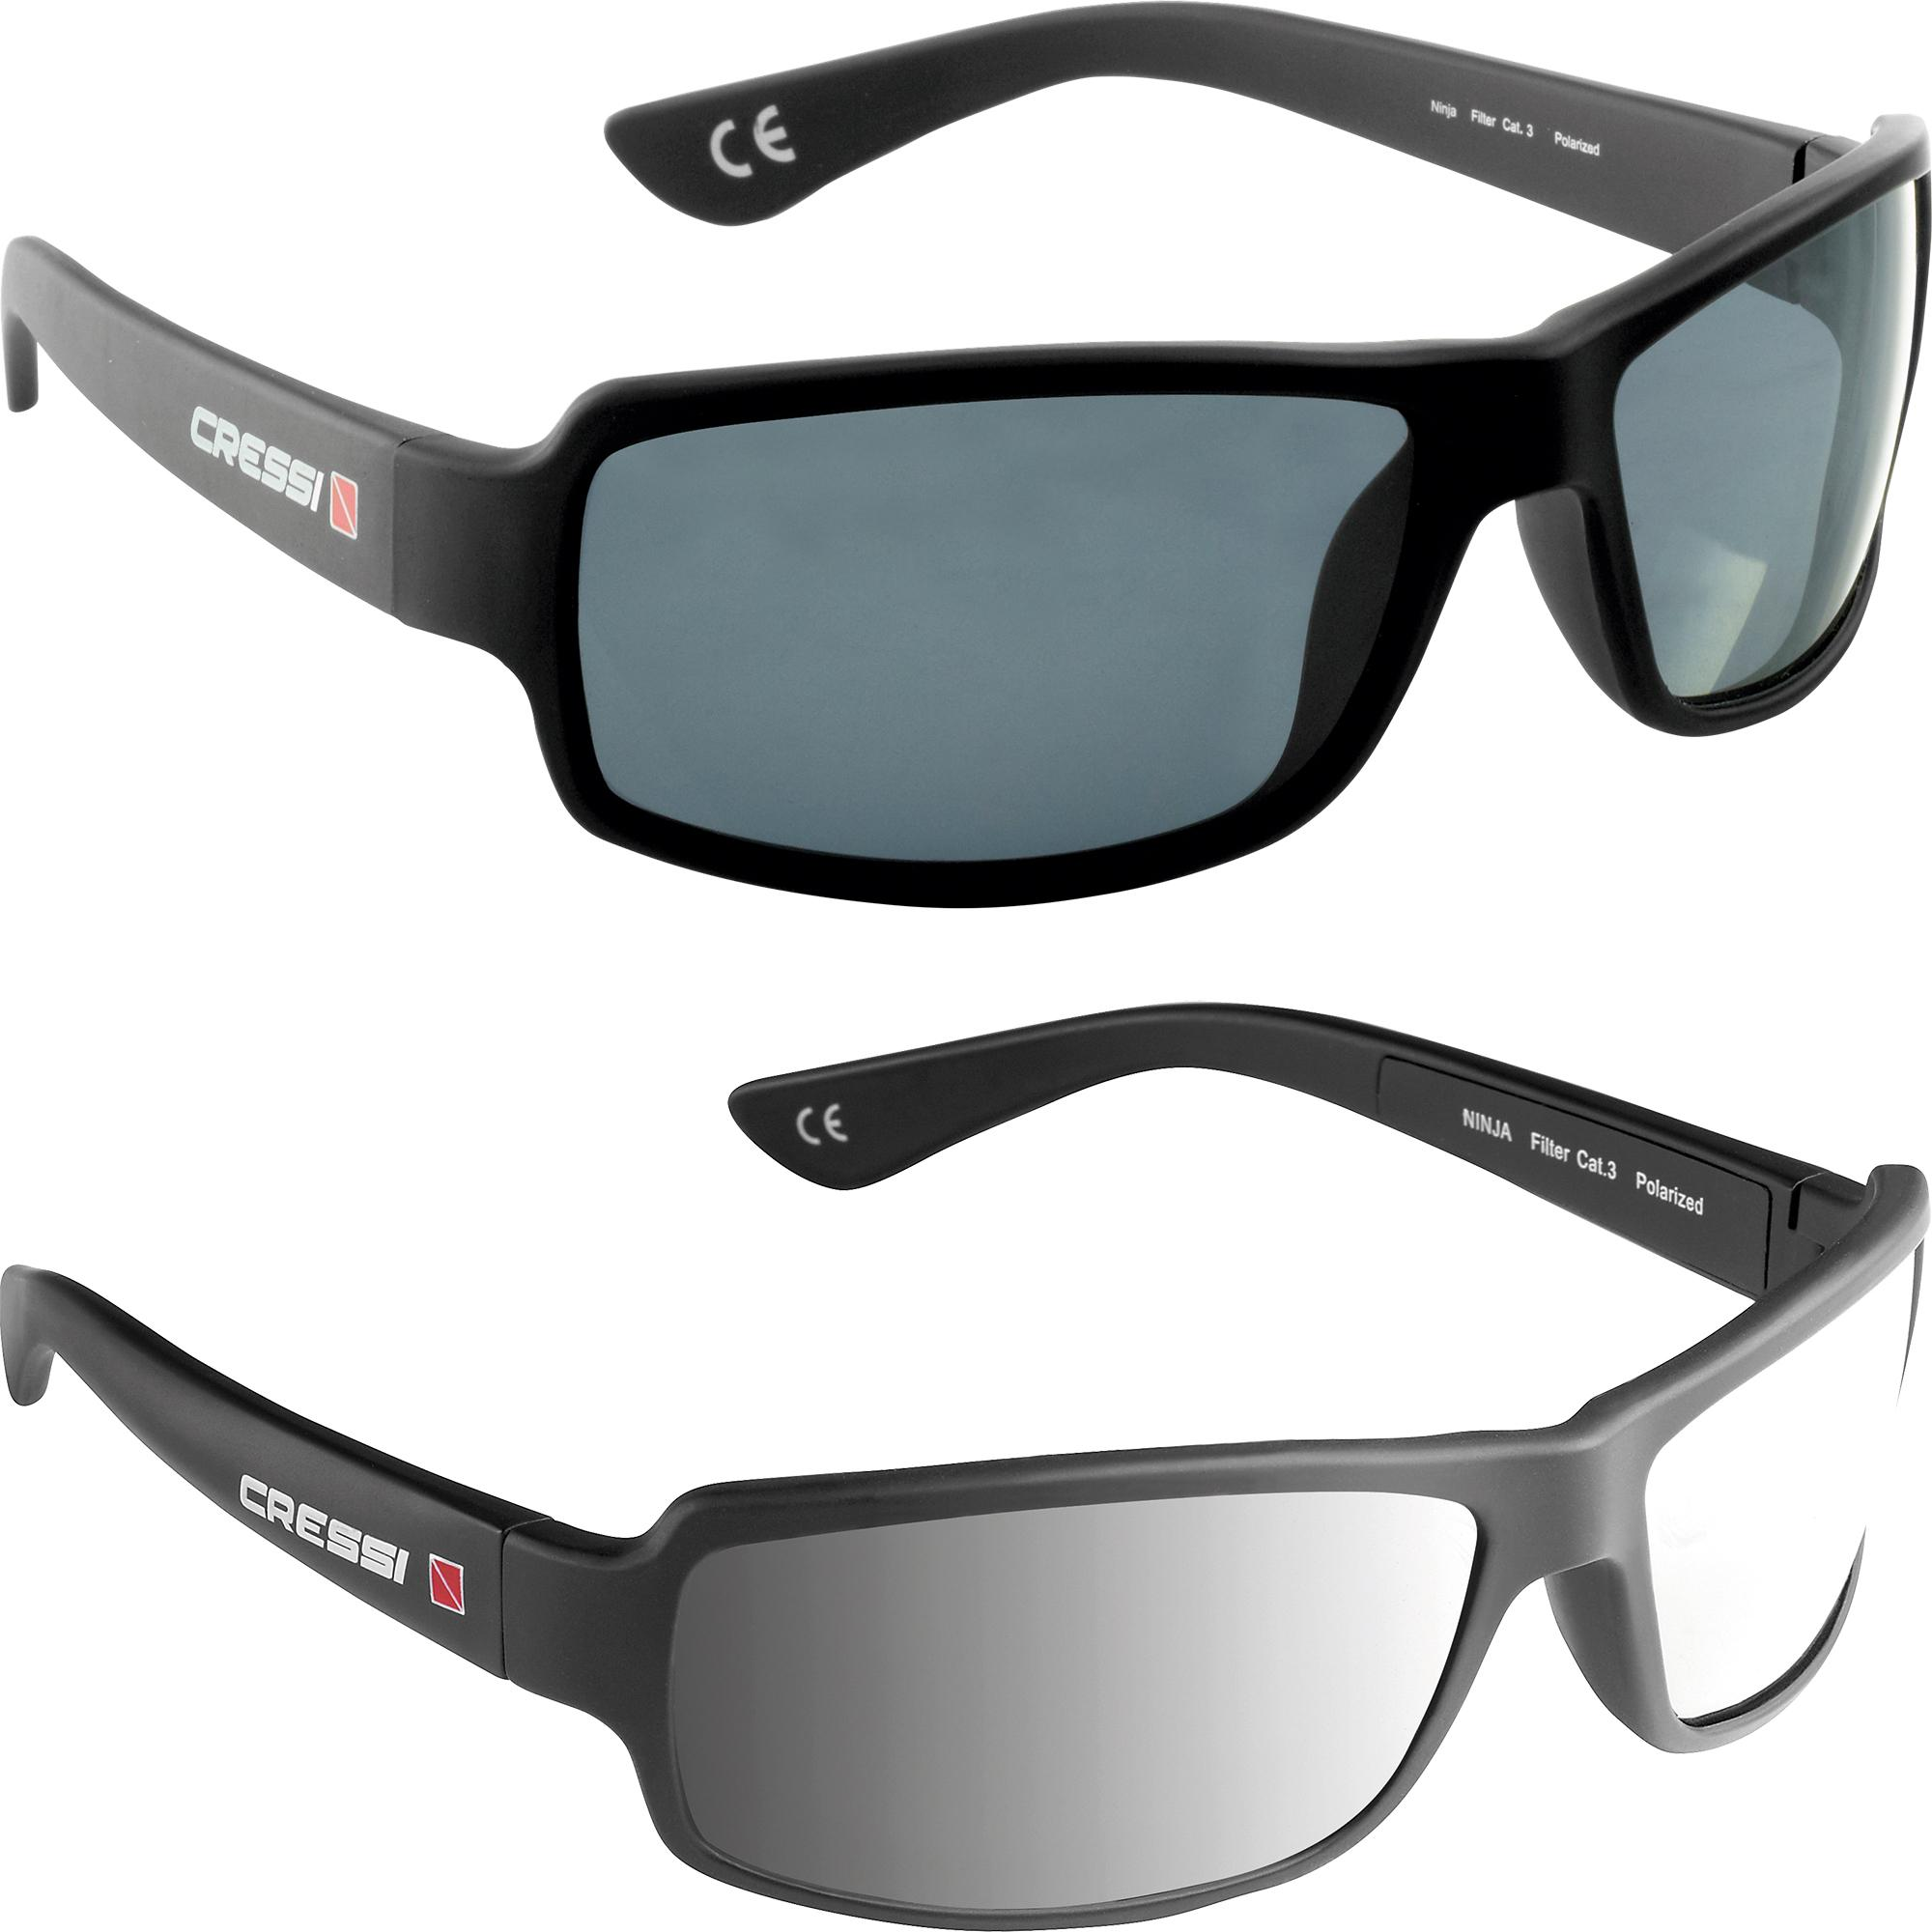 d198b35615 B 52 Polarized Floating Sunglasses « Heritage Malta